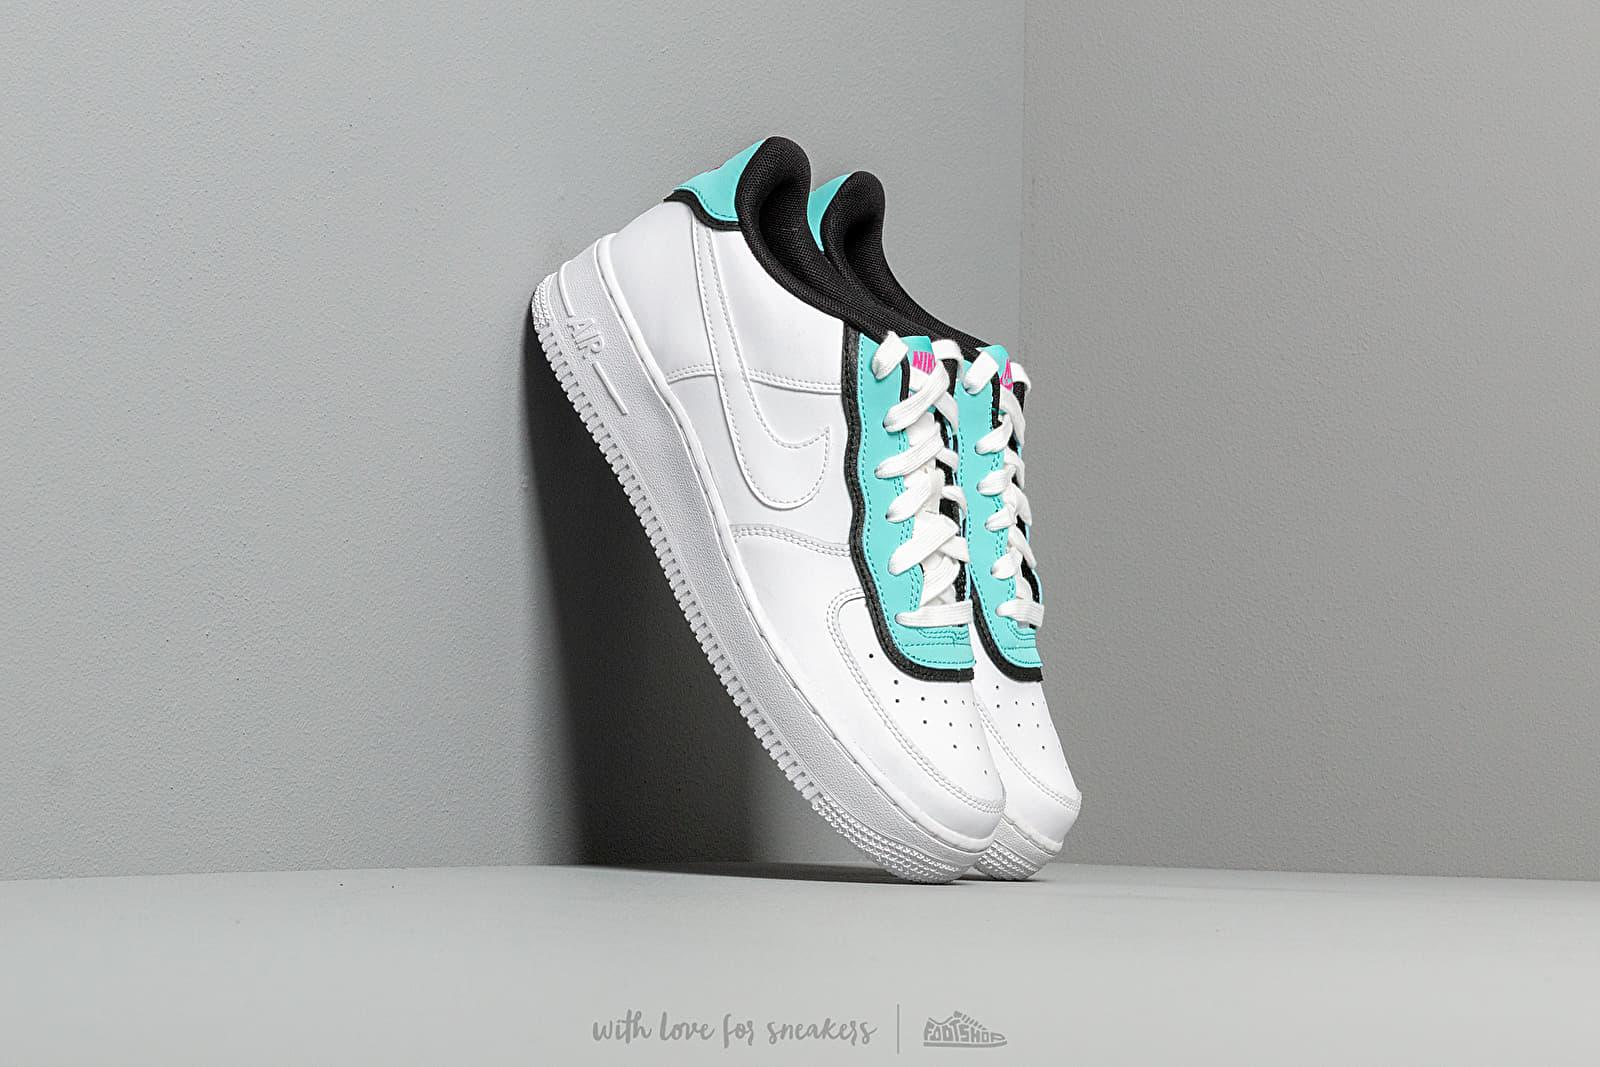 Nike Air Force 1 LV8 1 Double GS White/ White-Light Aqua-Black za skvělou cenu 2 190 Kč koupíte na Footshop.cz